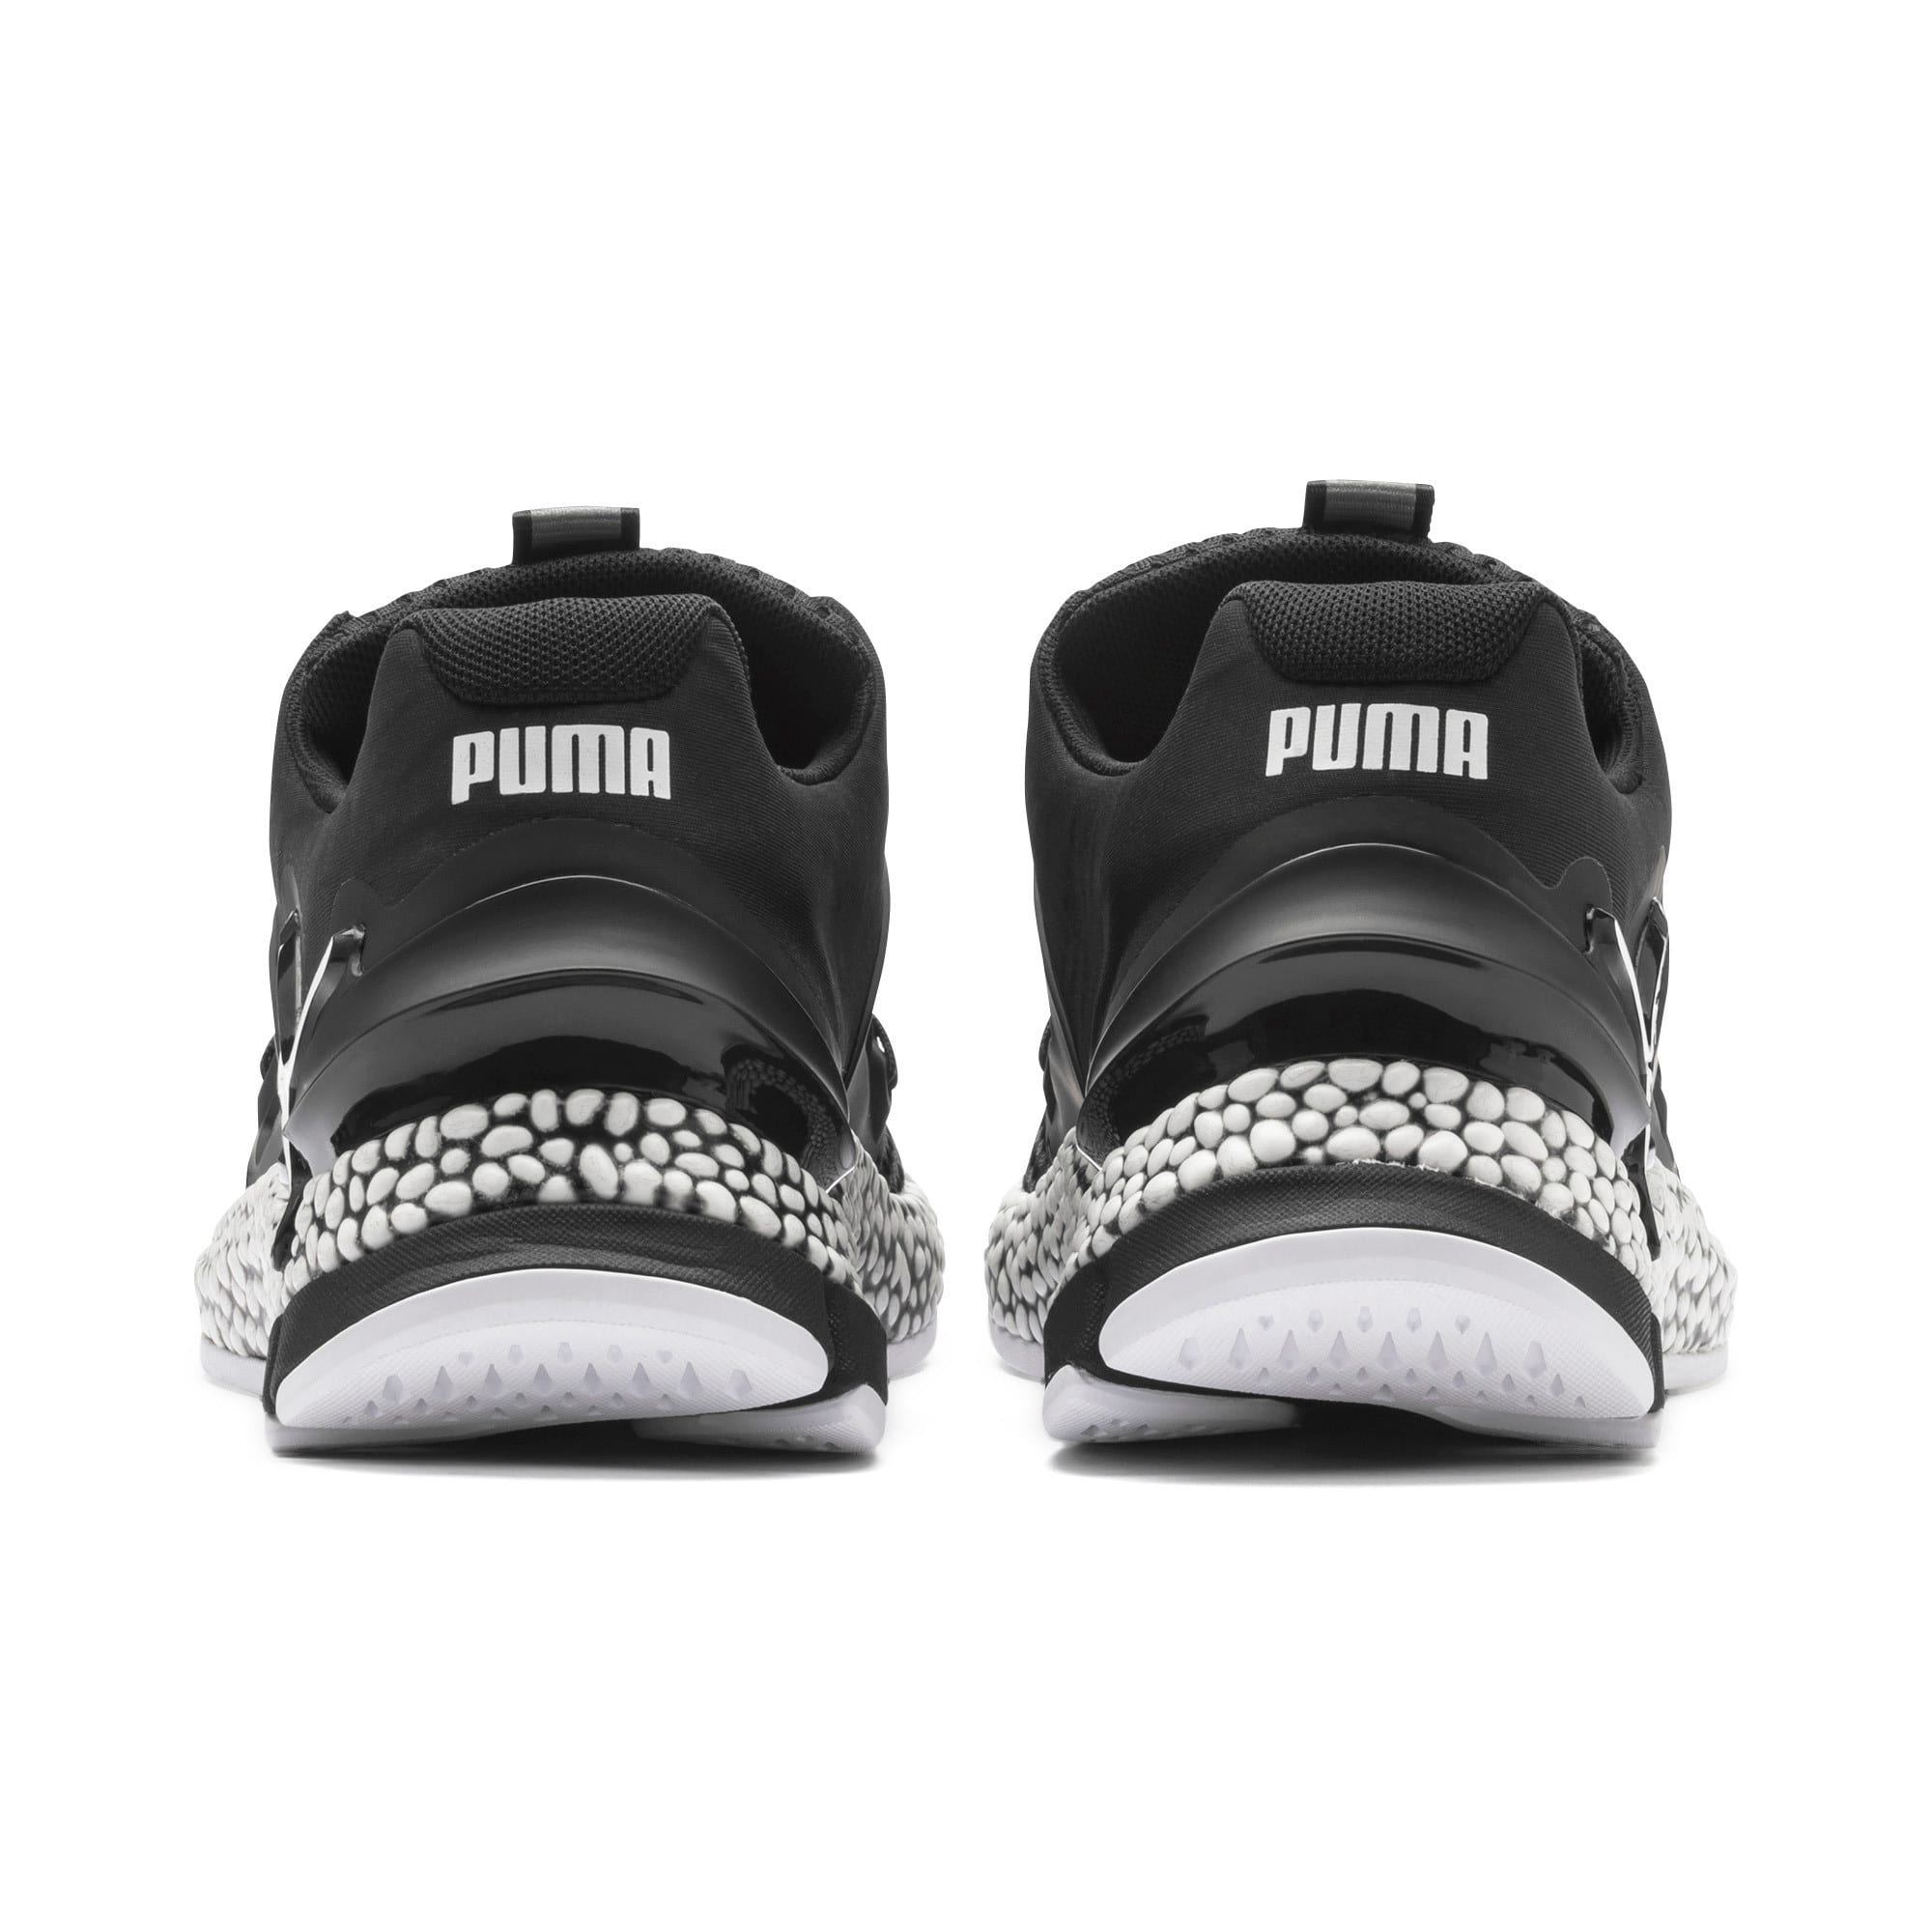 Thumbnail 4 of ハイブリッド スカイ, Puma Black-Puma White, medium-JPN